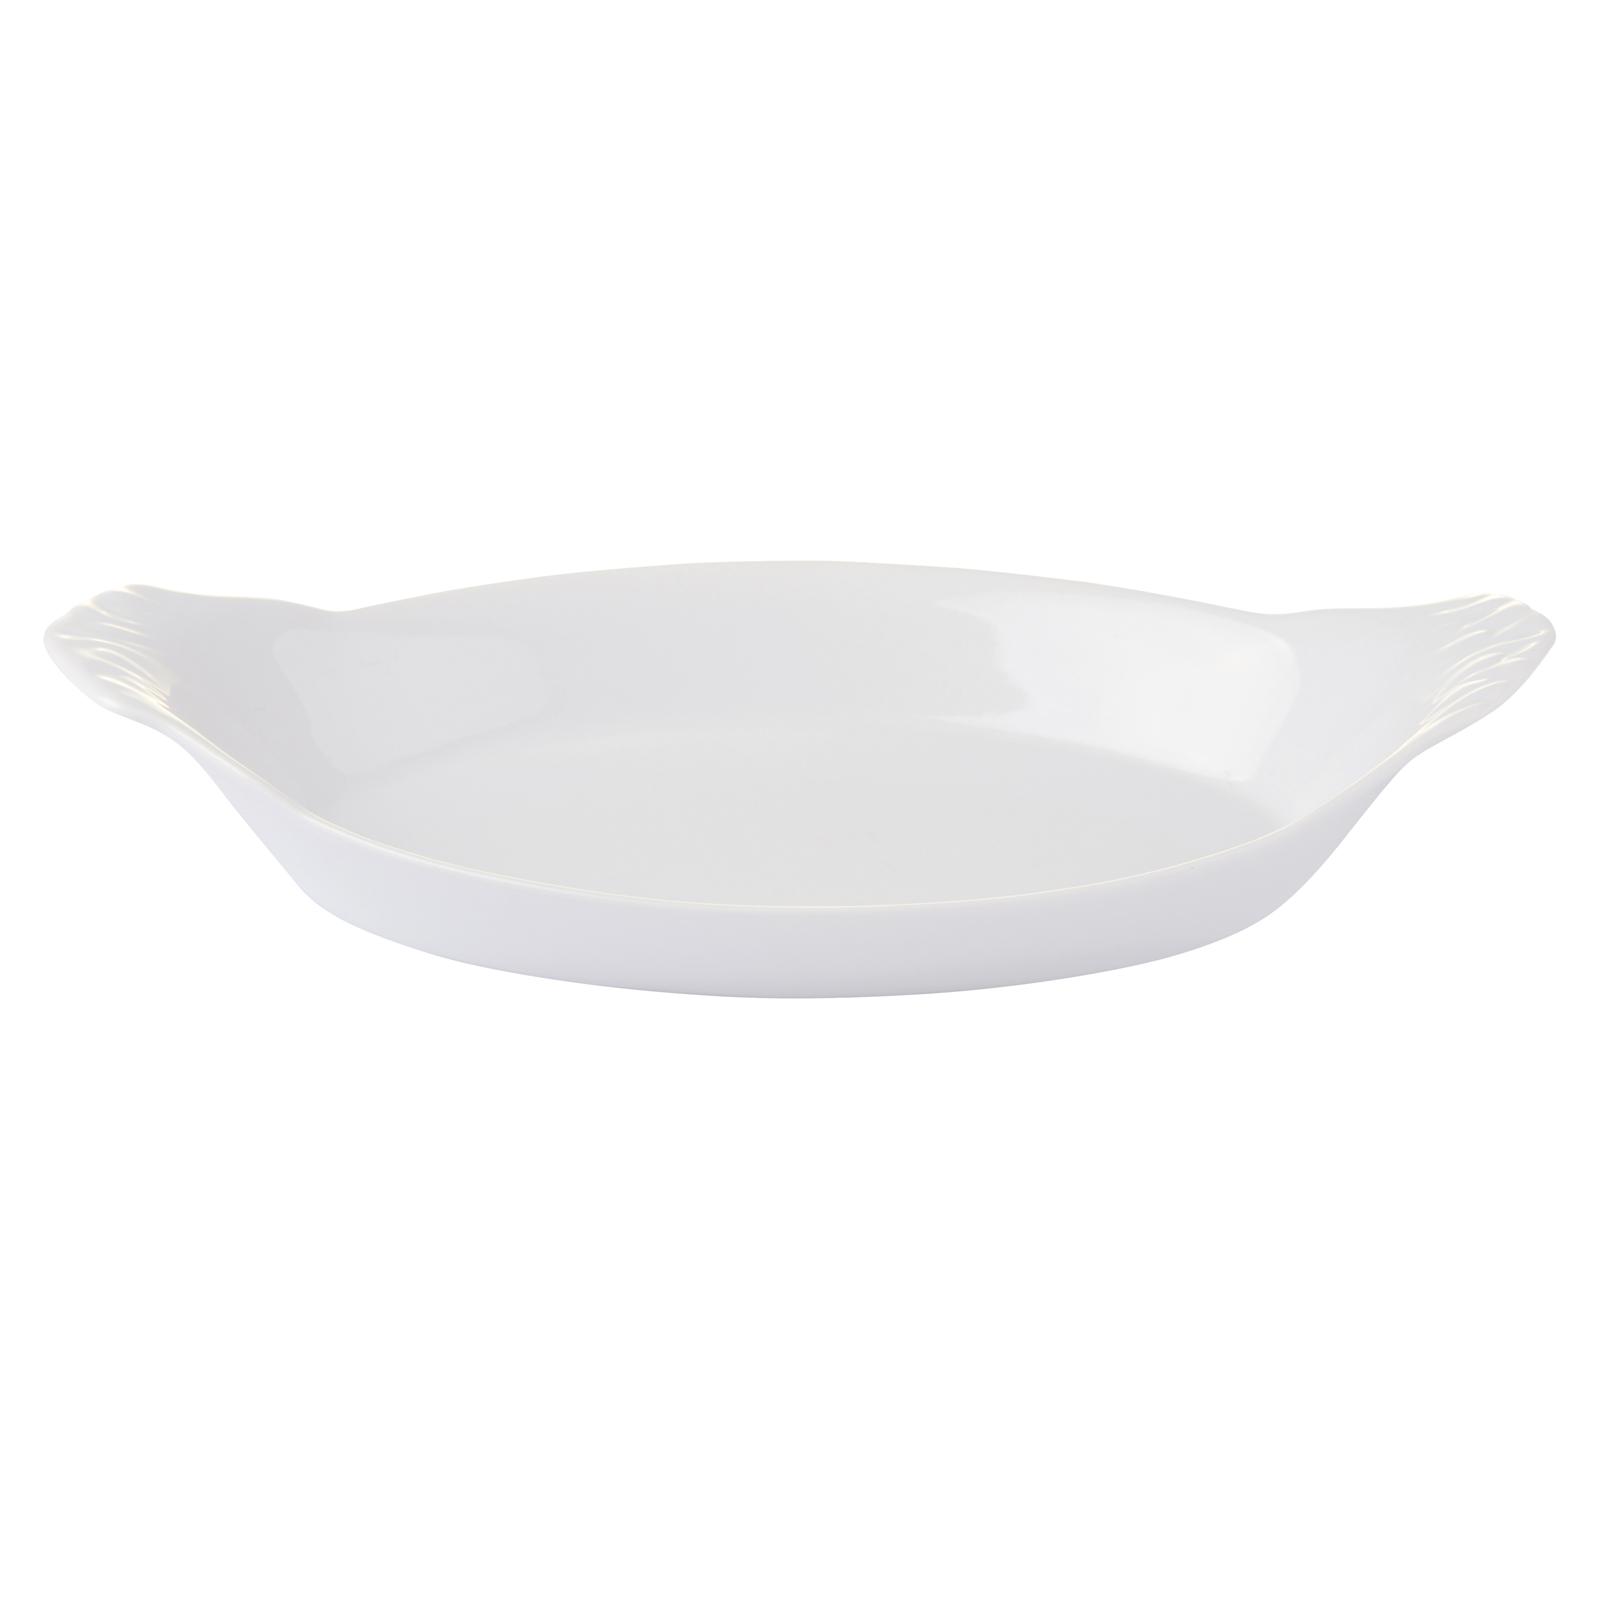 Oval Eared Dish Medium by BIA